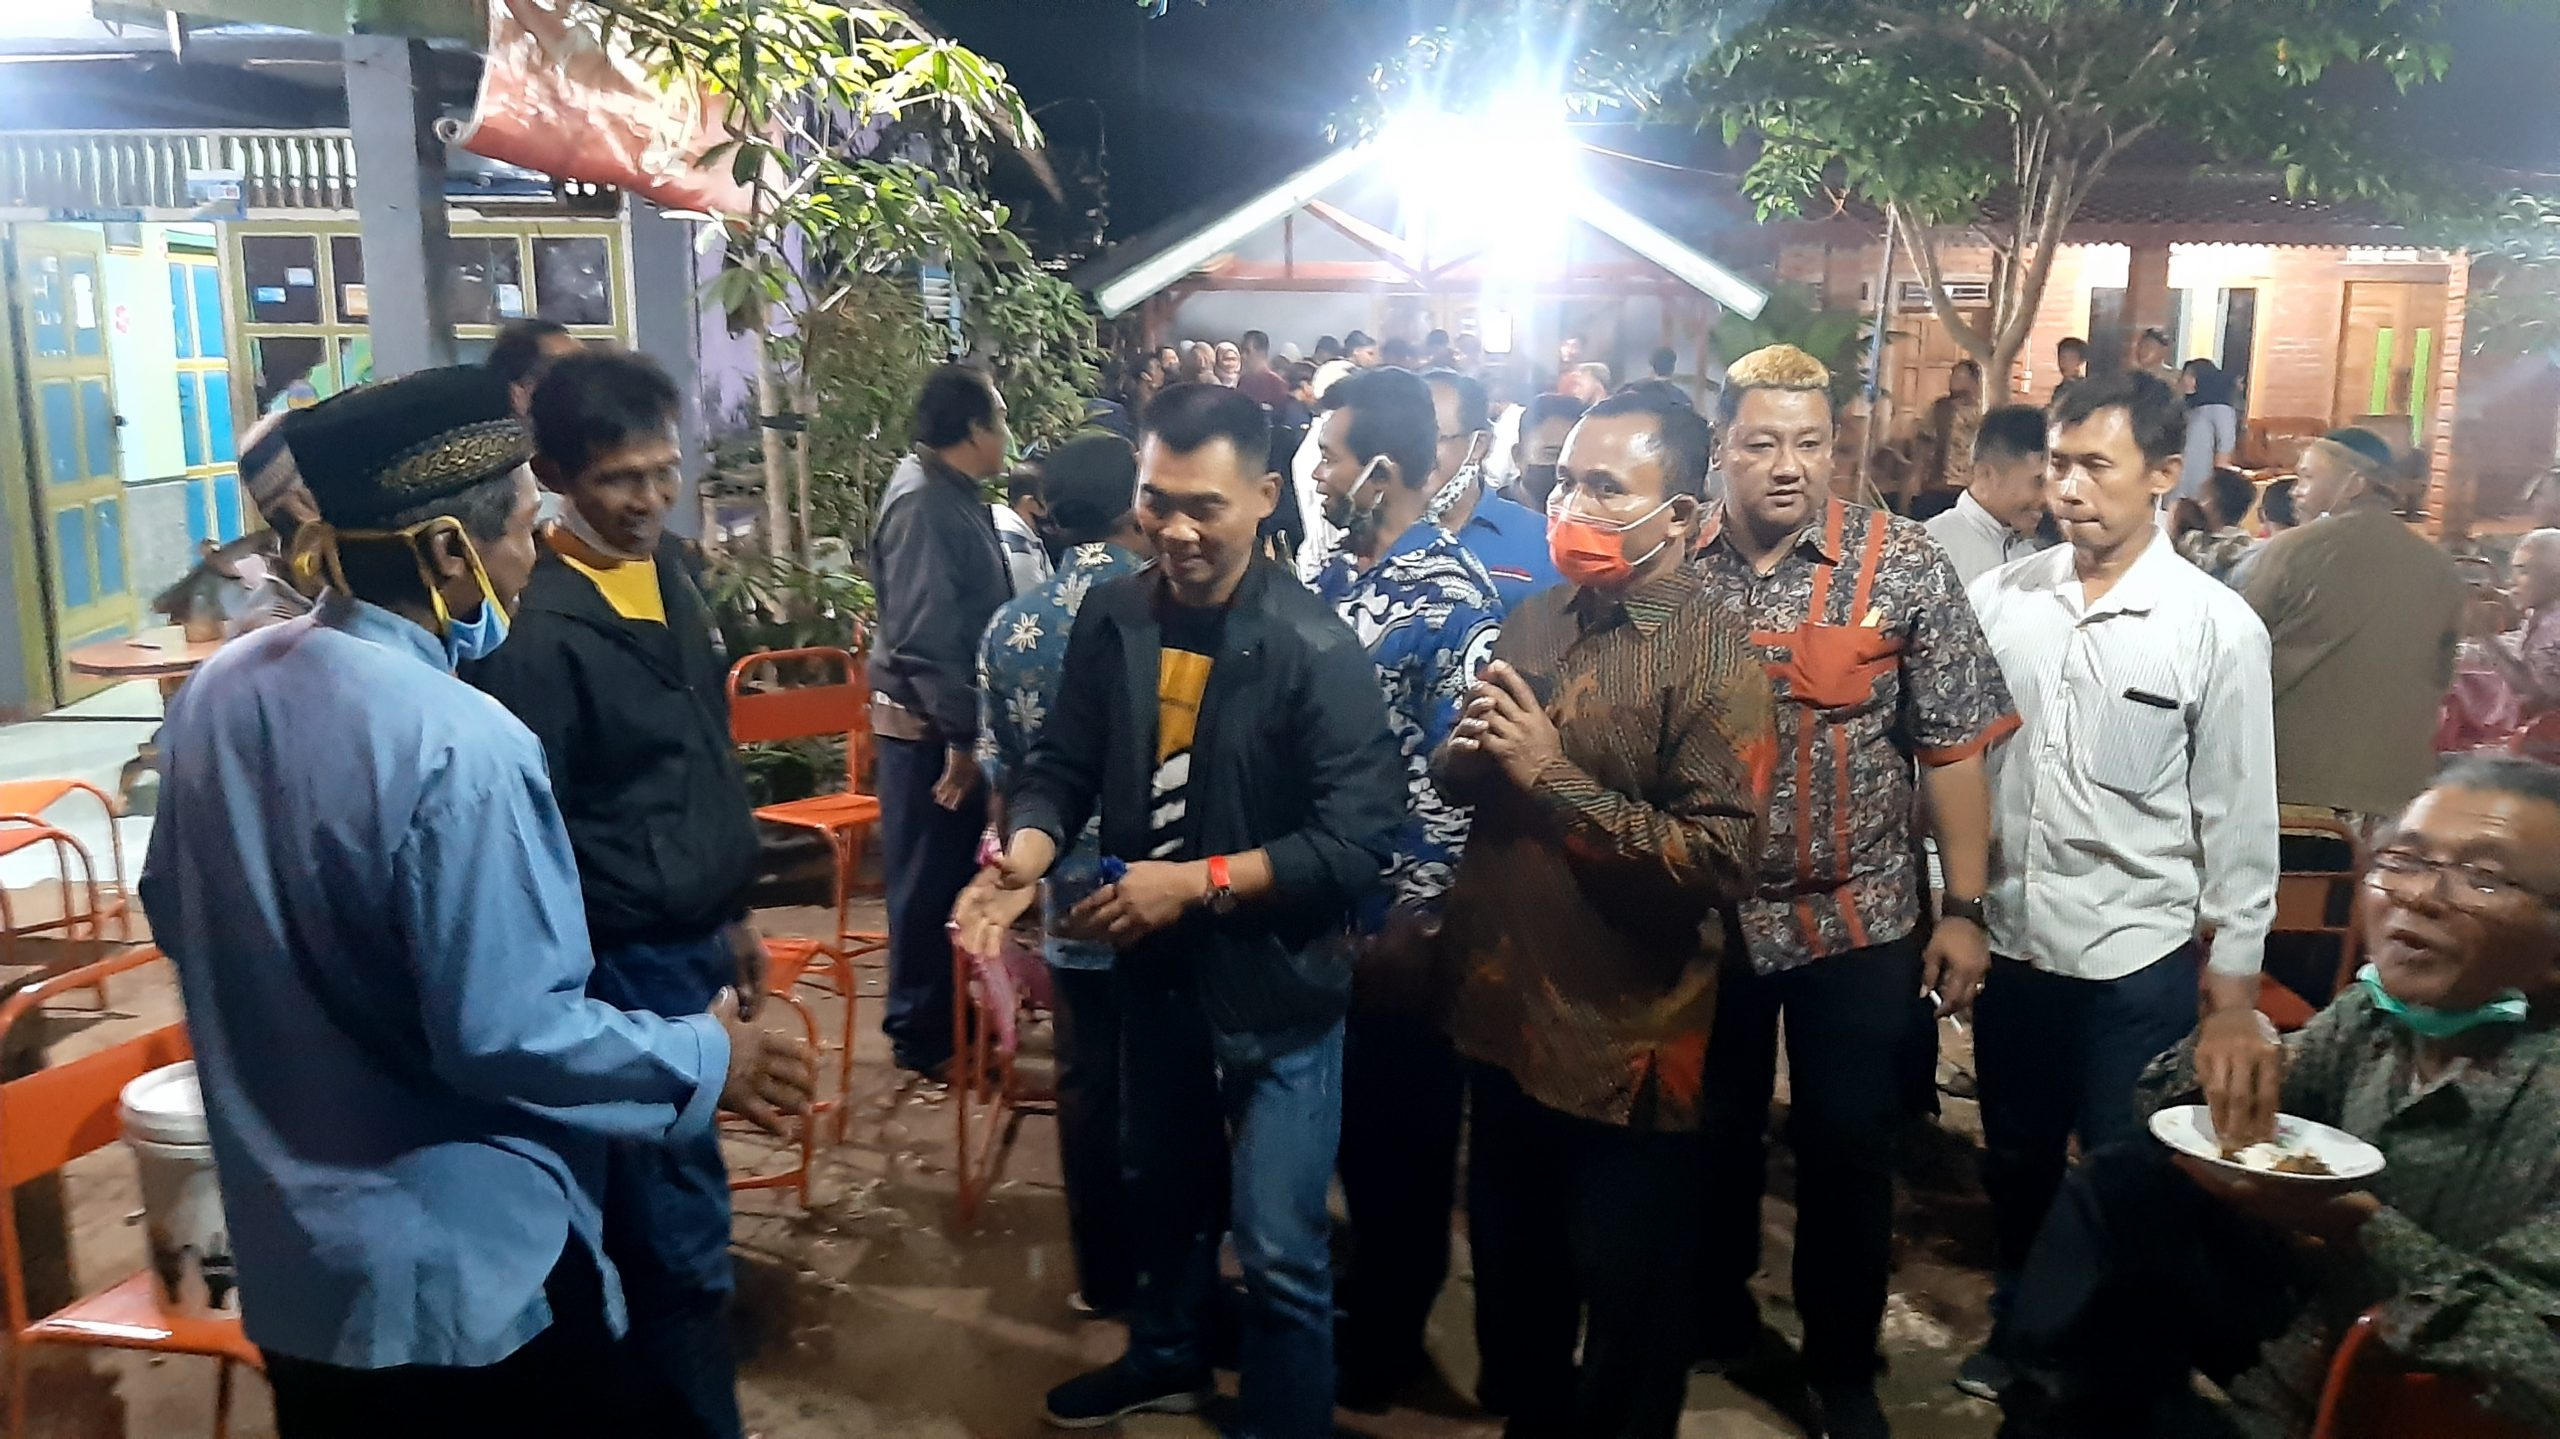 Sunaryanta Gerogoti Basis Massa Kader PAN di Tanjungsari 157